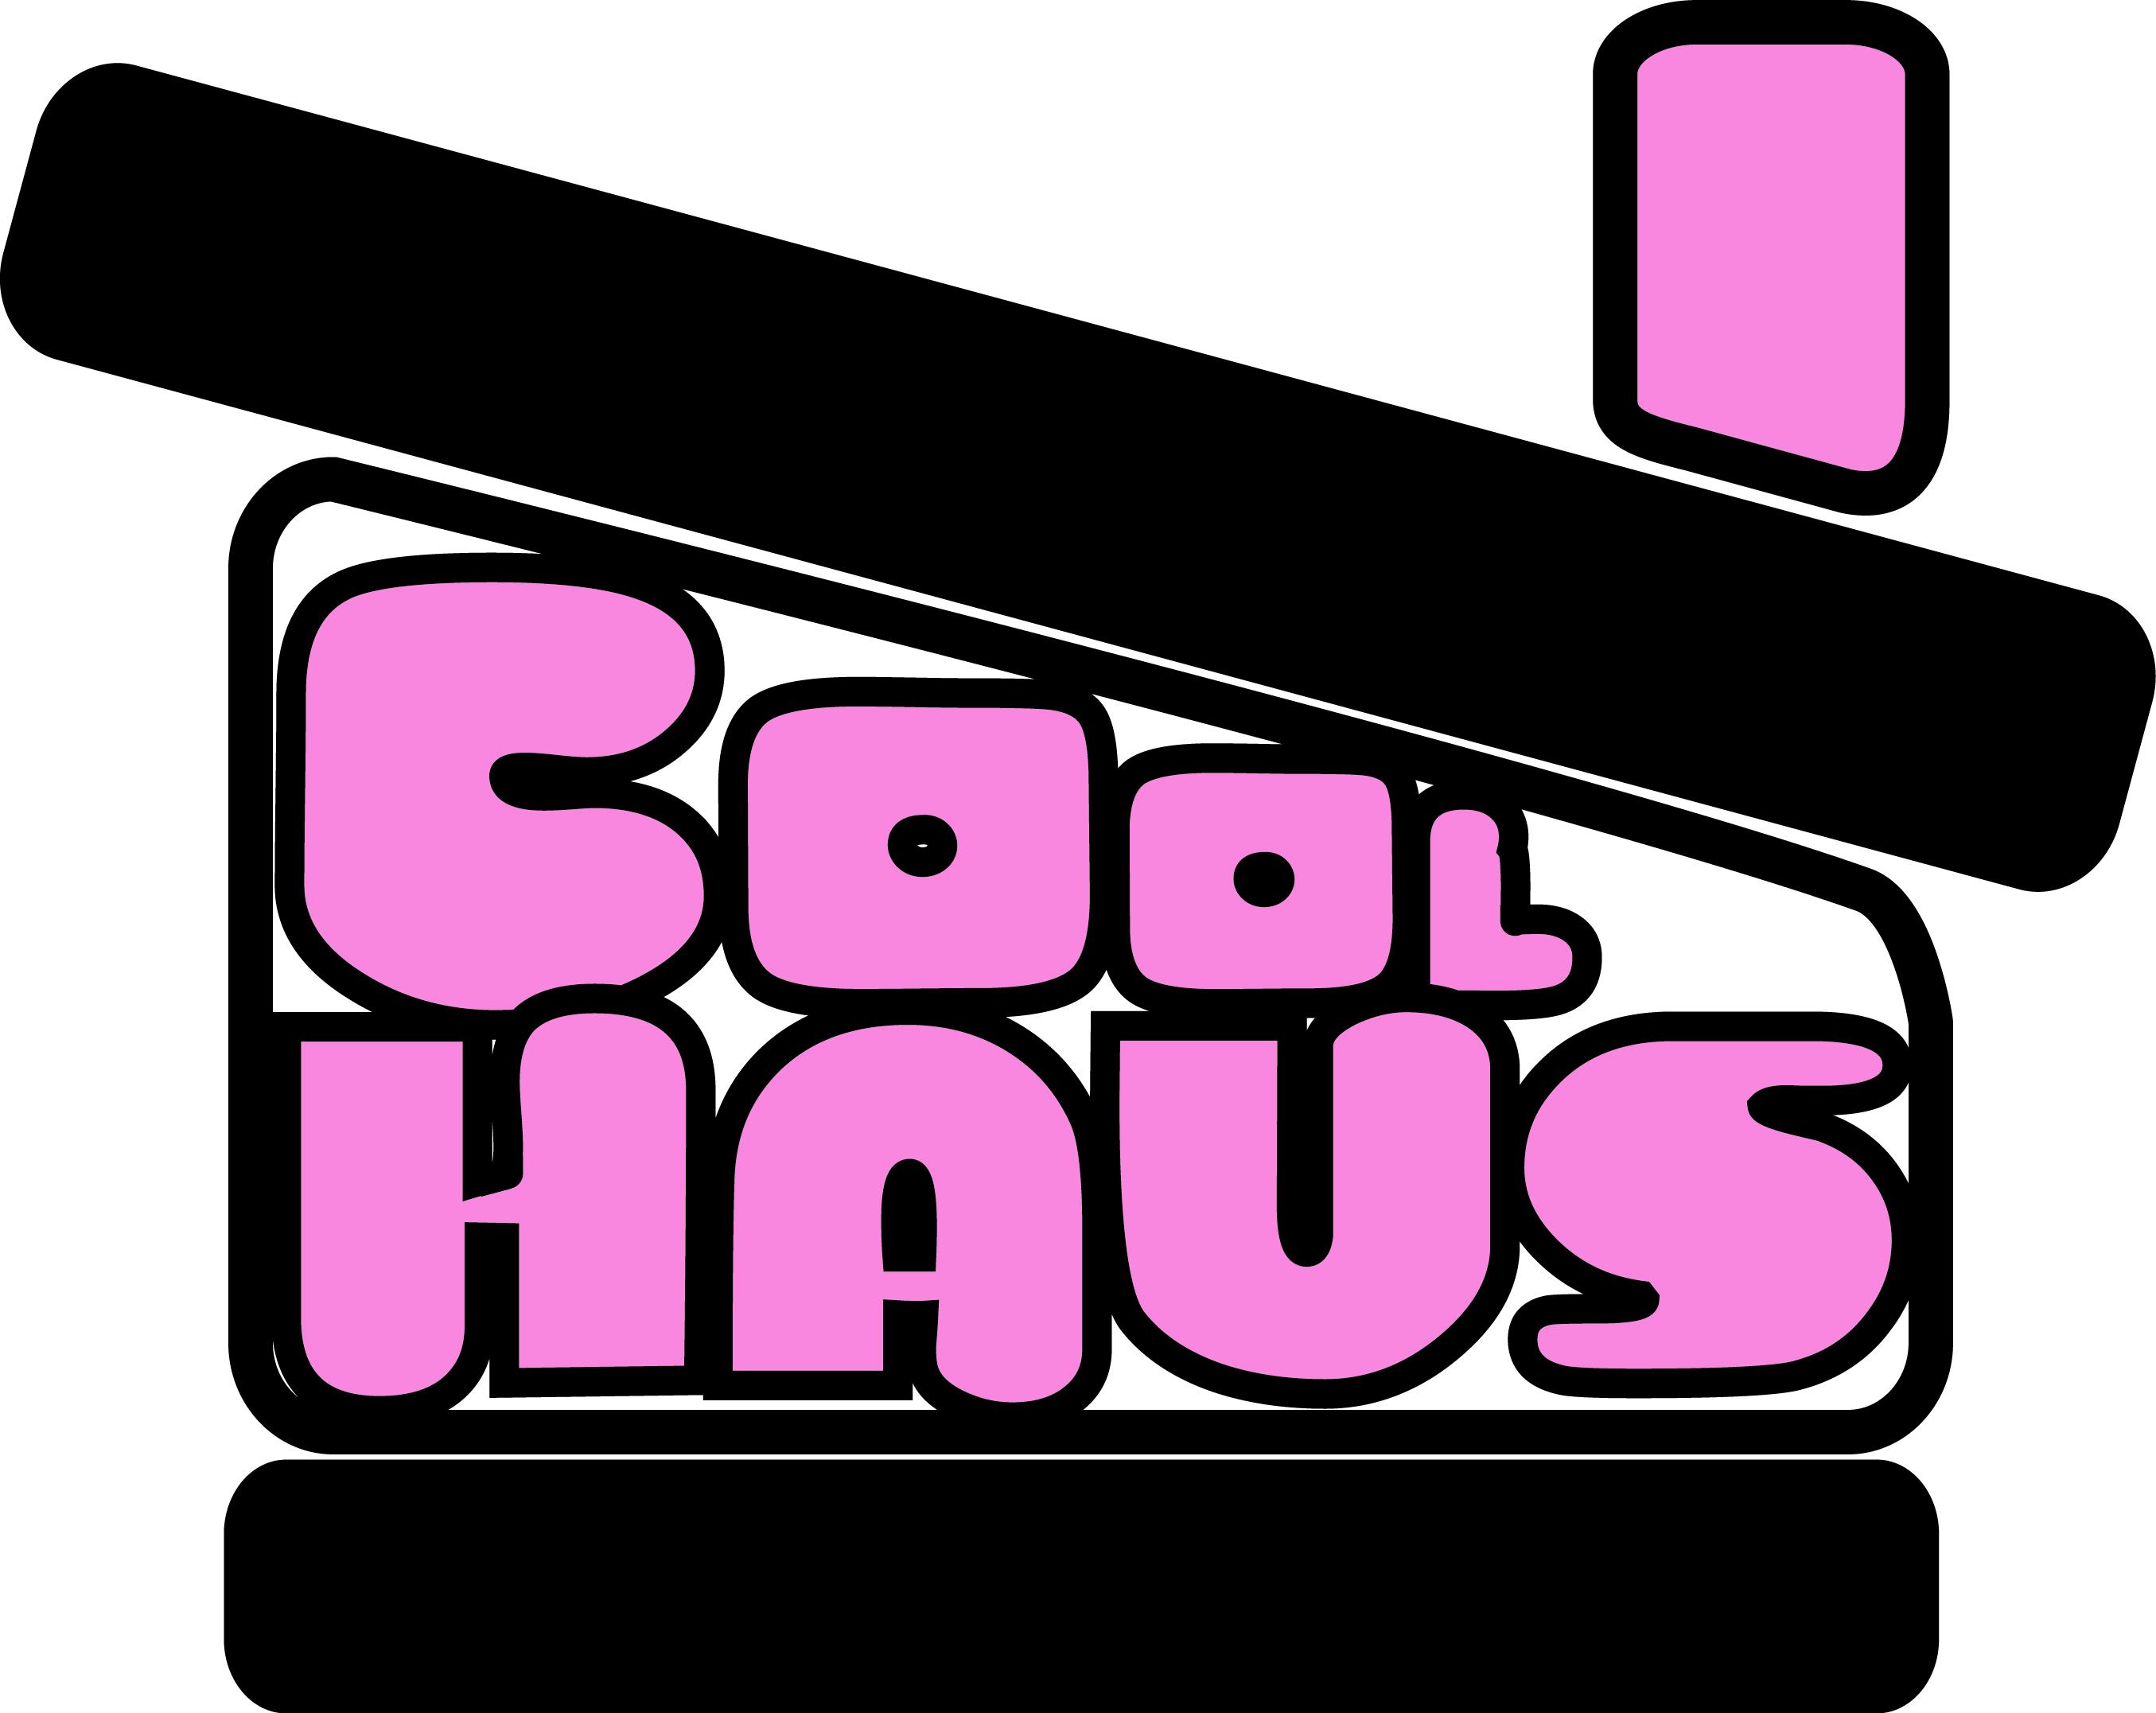 coolhaus ice cream sandwiches aust food trucks in austin tx